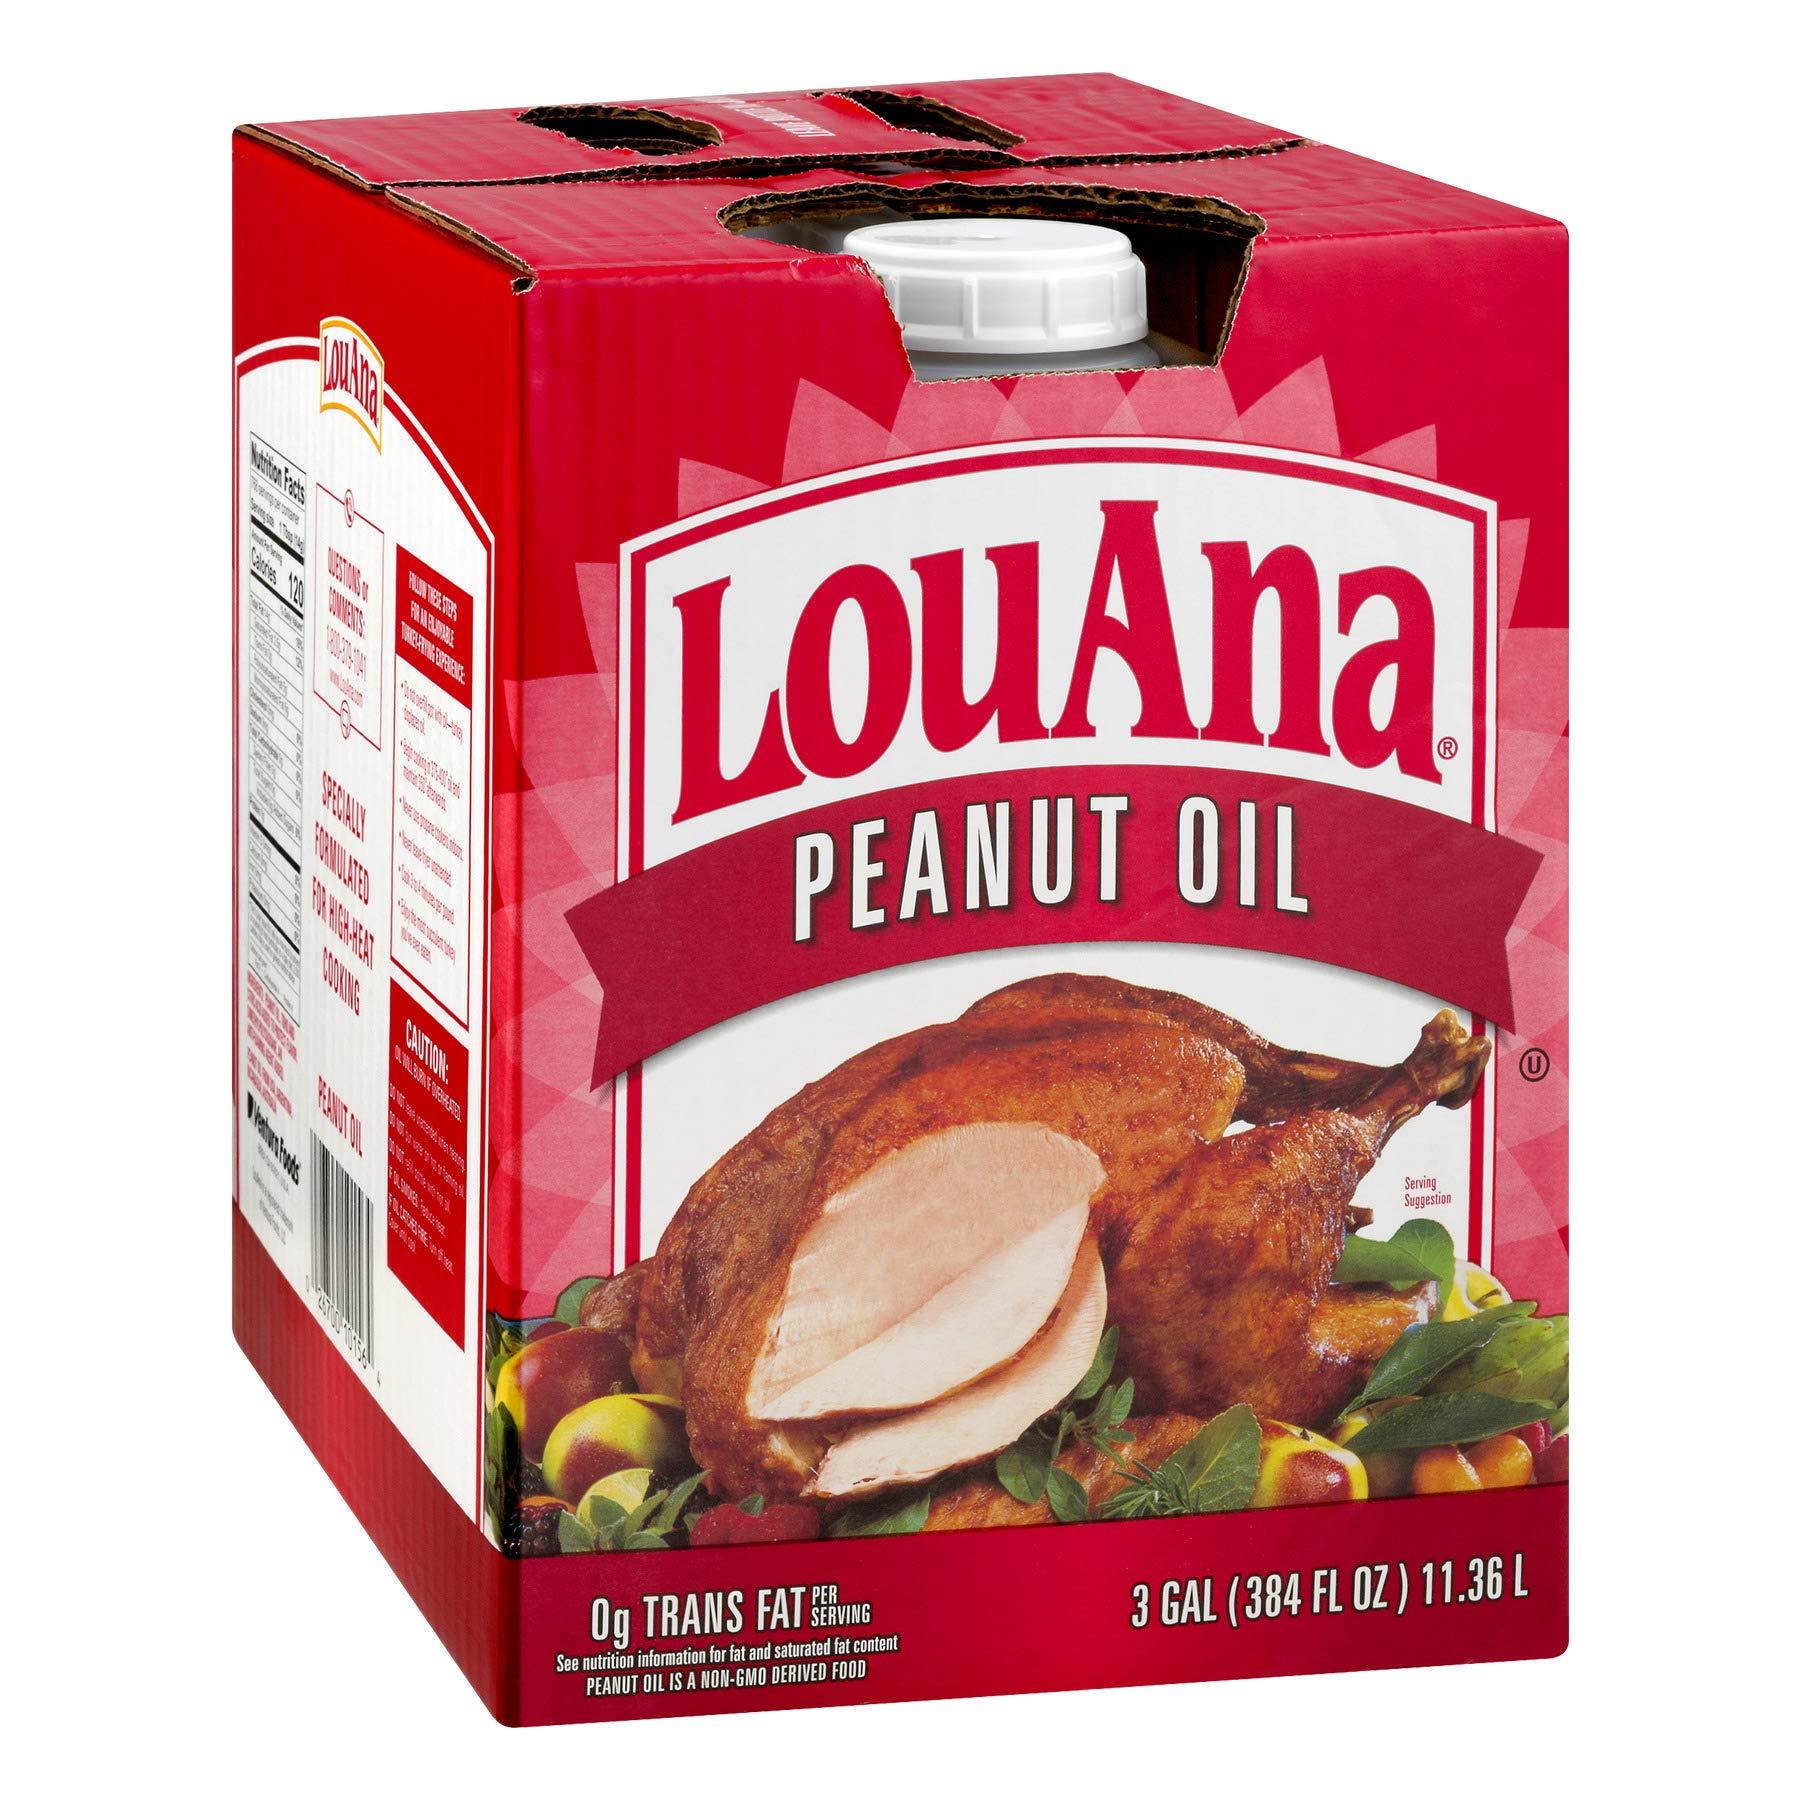 LouAna Peanut Oil, 3 Gallon - Pack of 1 by LouAna